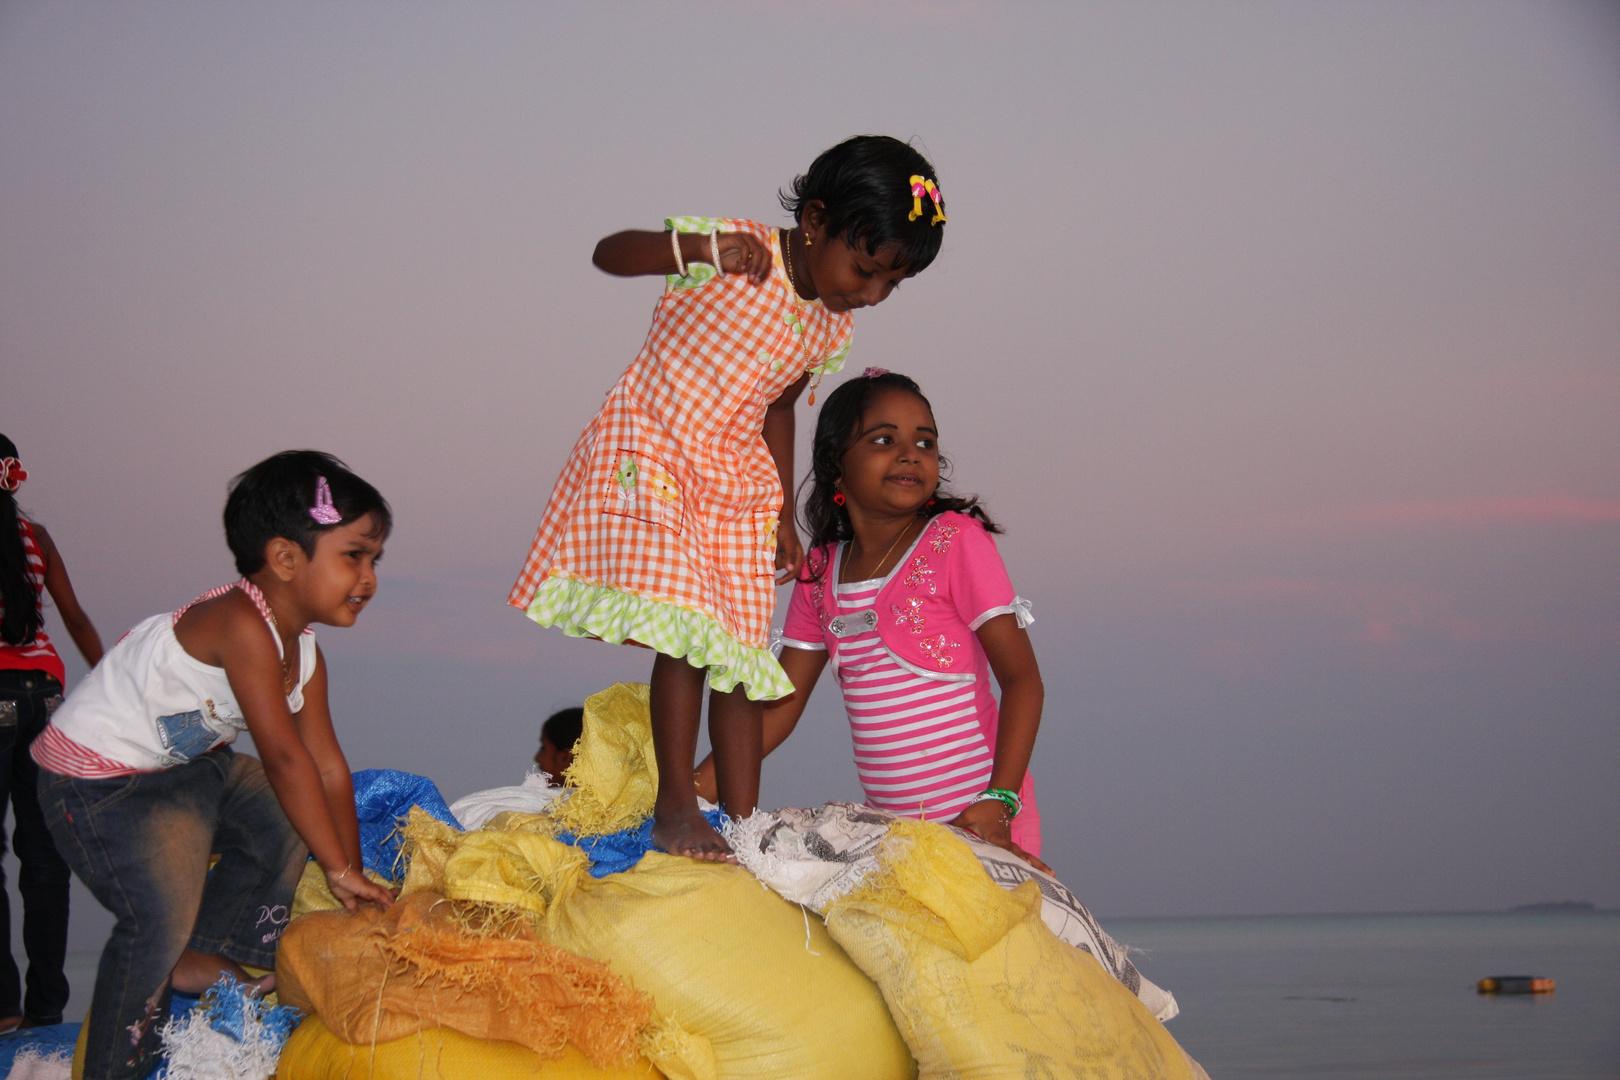 Malediven, Fulidhoo Island, Spielende Kinder 2010